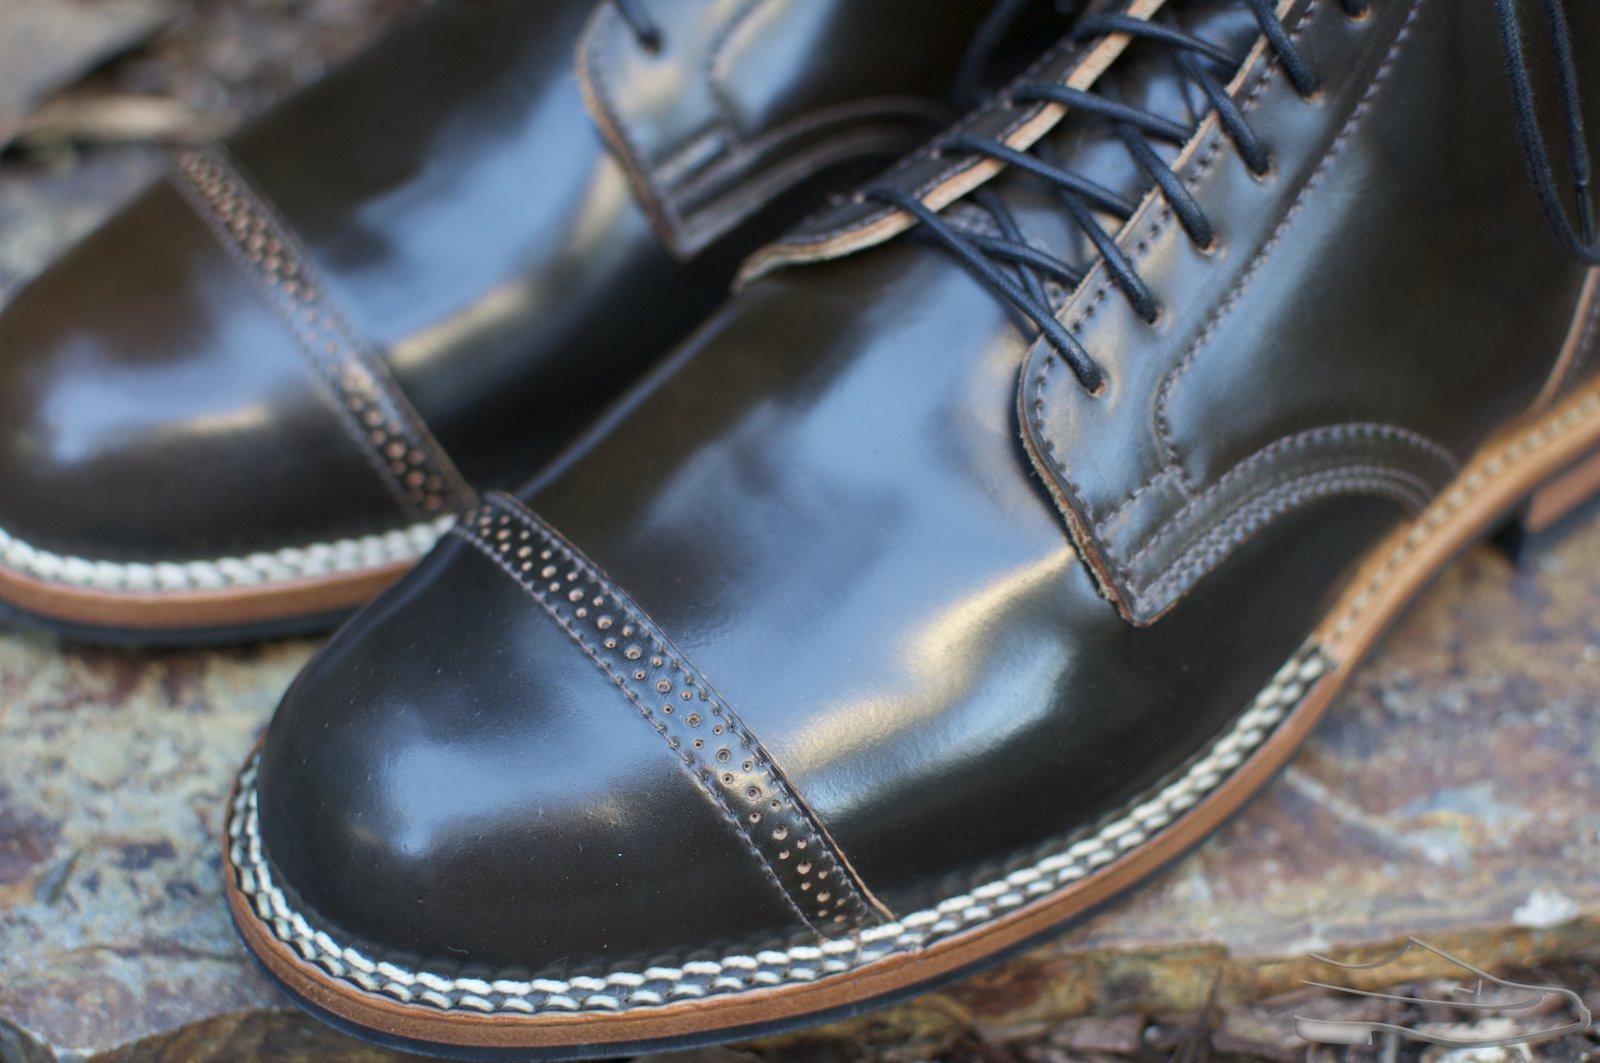 Viberg Dark Cognac Shell Cordovan Service Boots - 2020-10-30 - 2.jpg